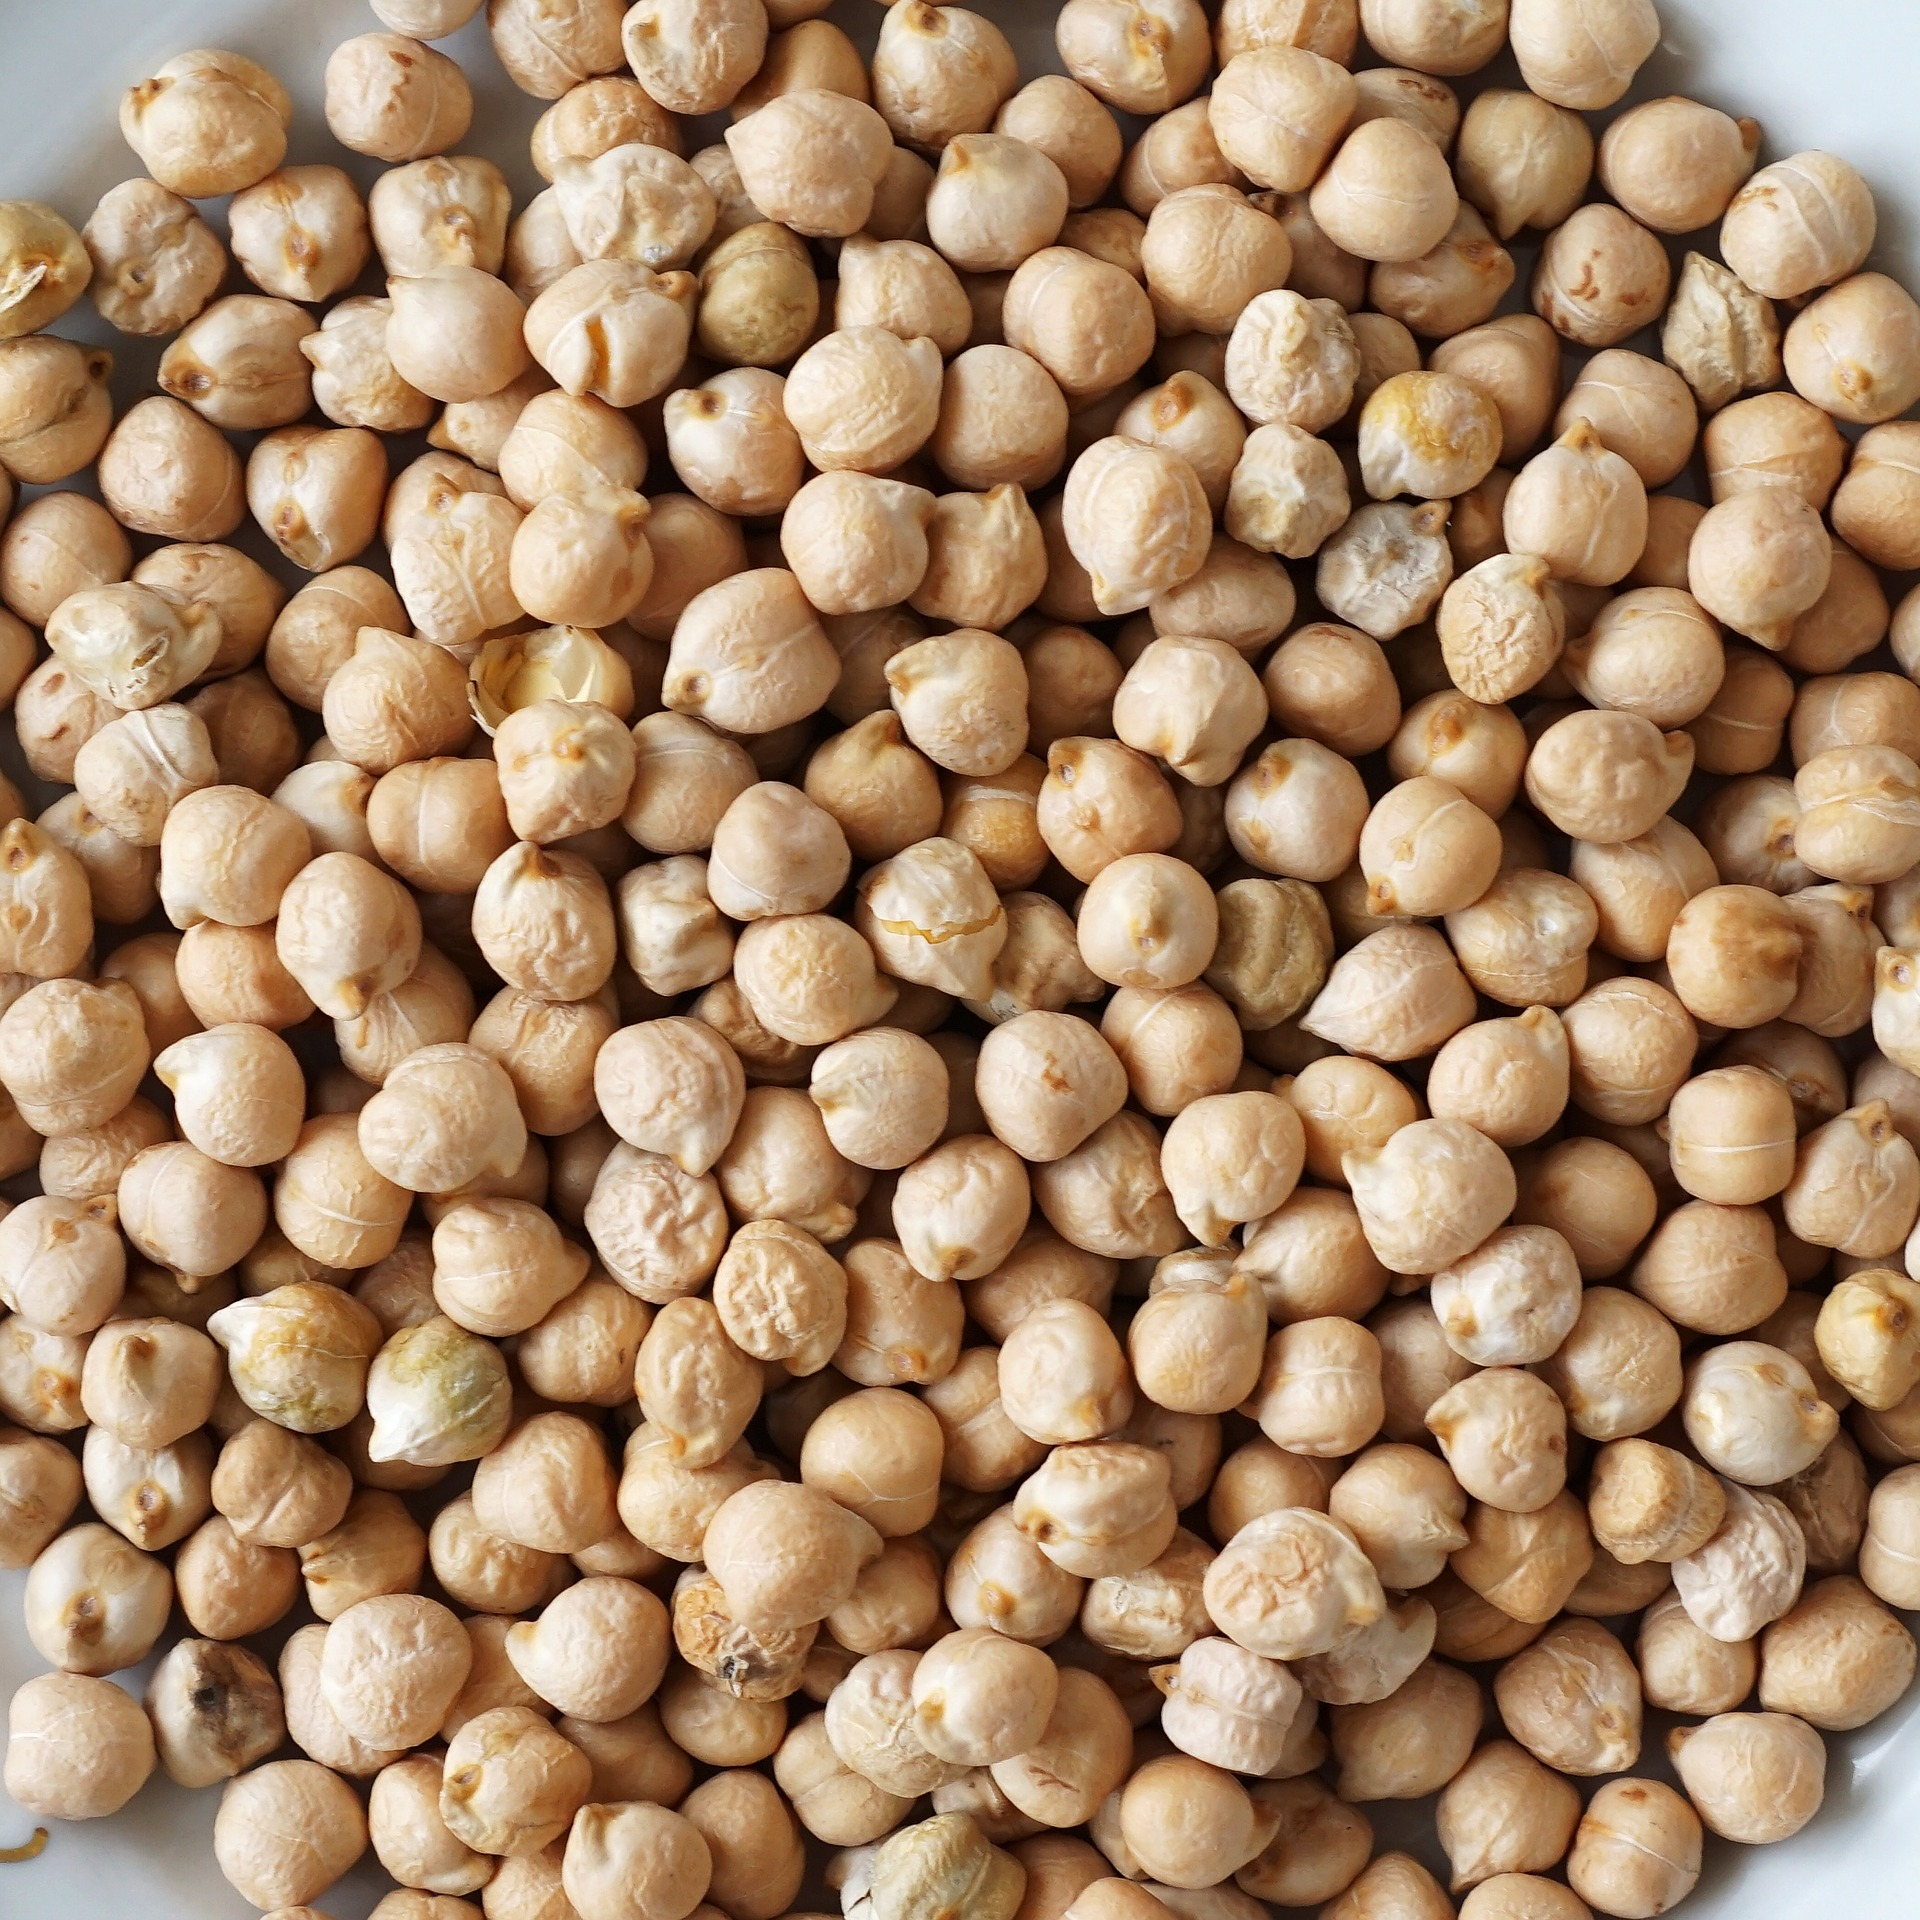 Chickpeas, Lentils, Mung Beans, Kabuli, Dun Peas, Pigeon Peas and Cow Peas, Faba Beans